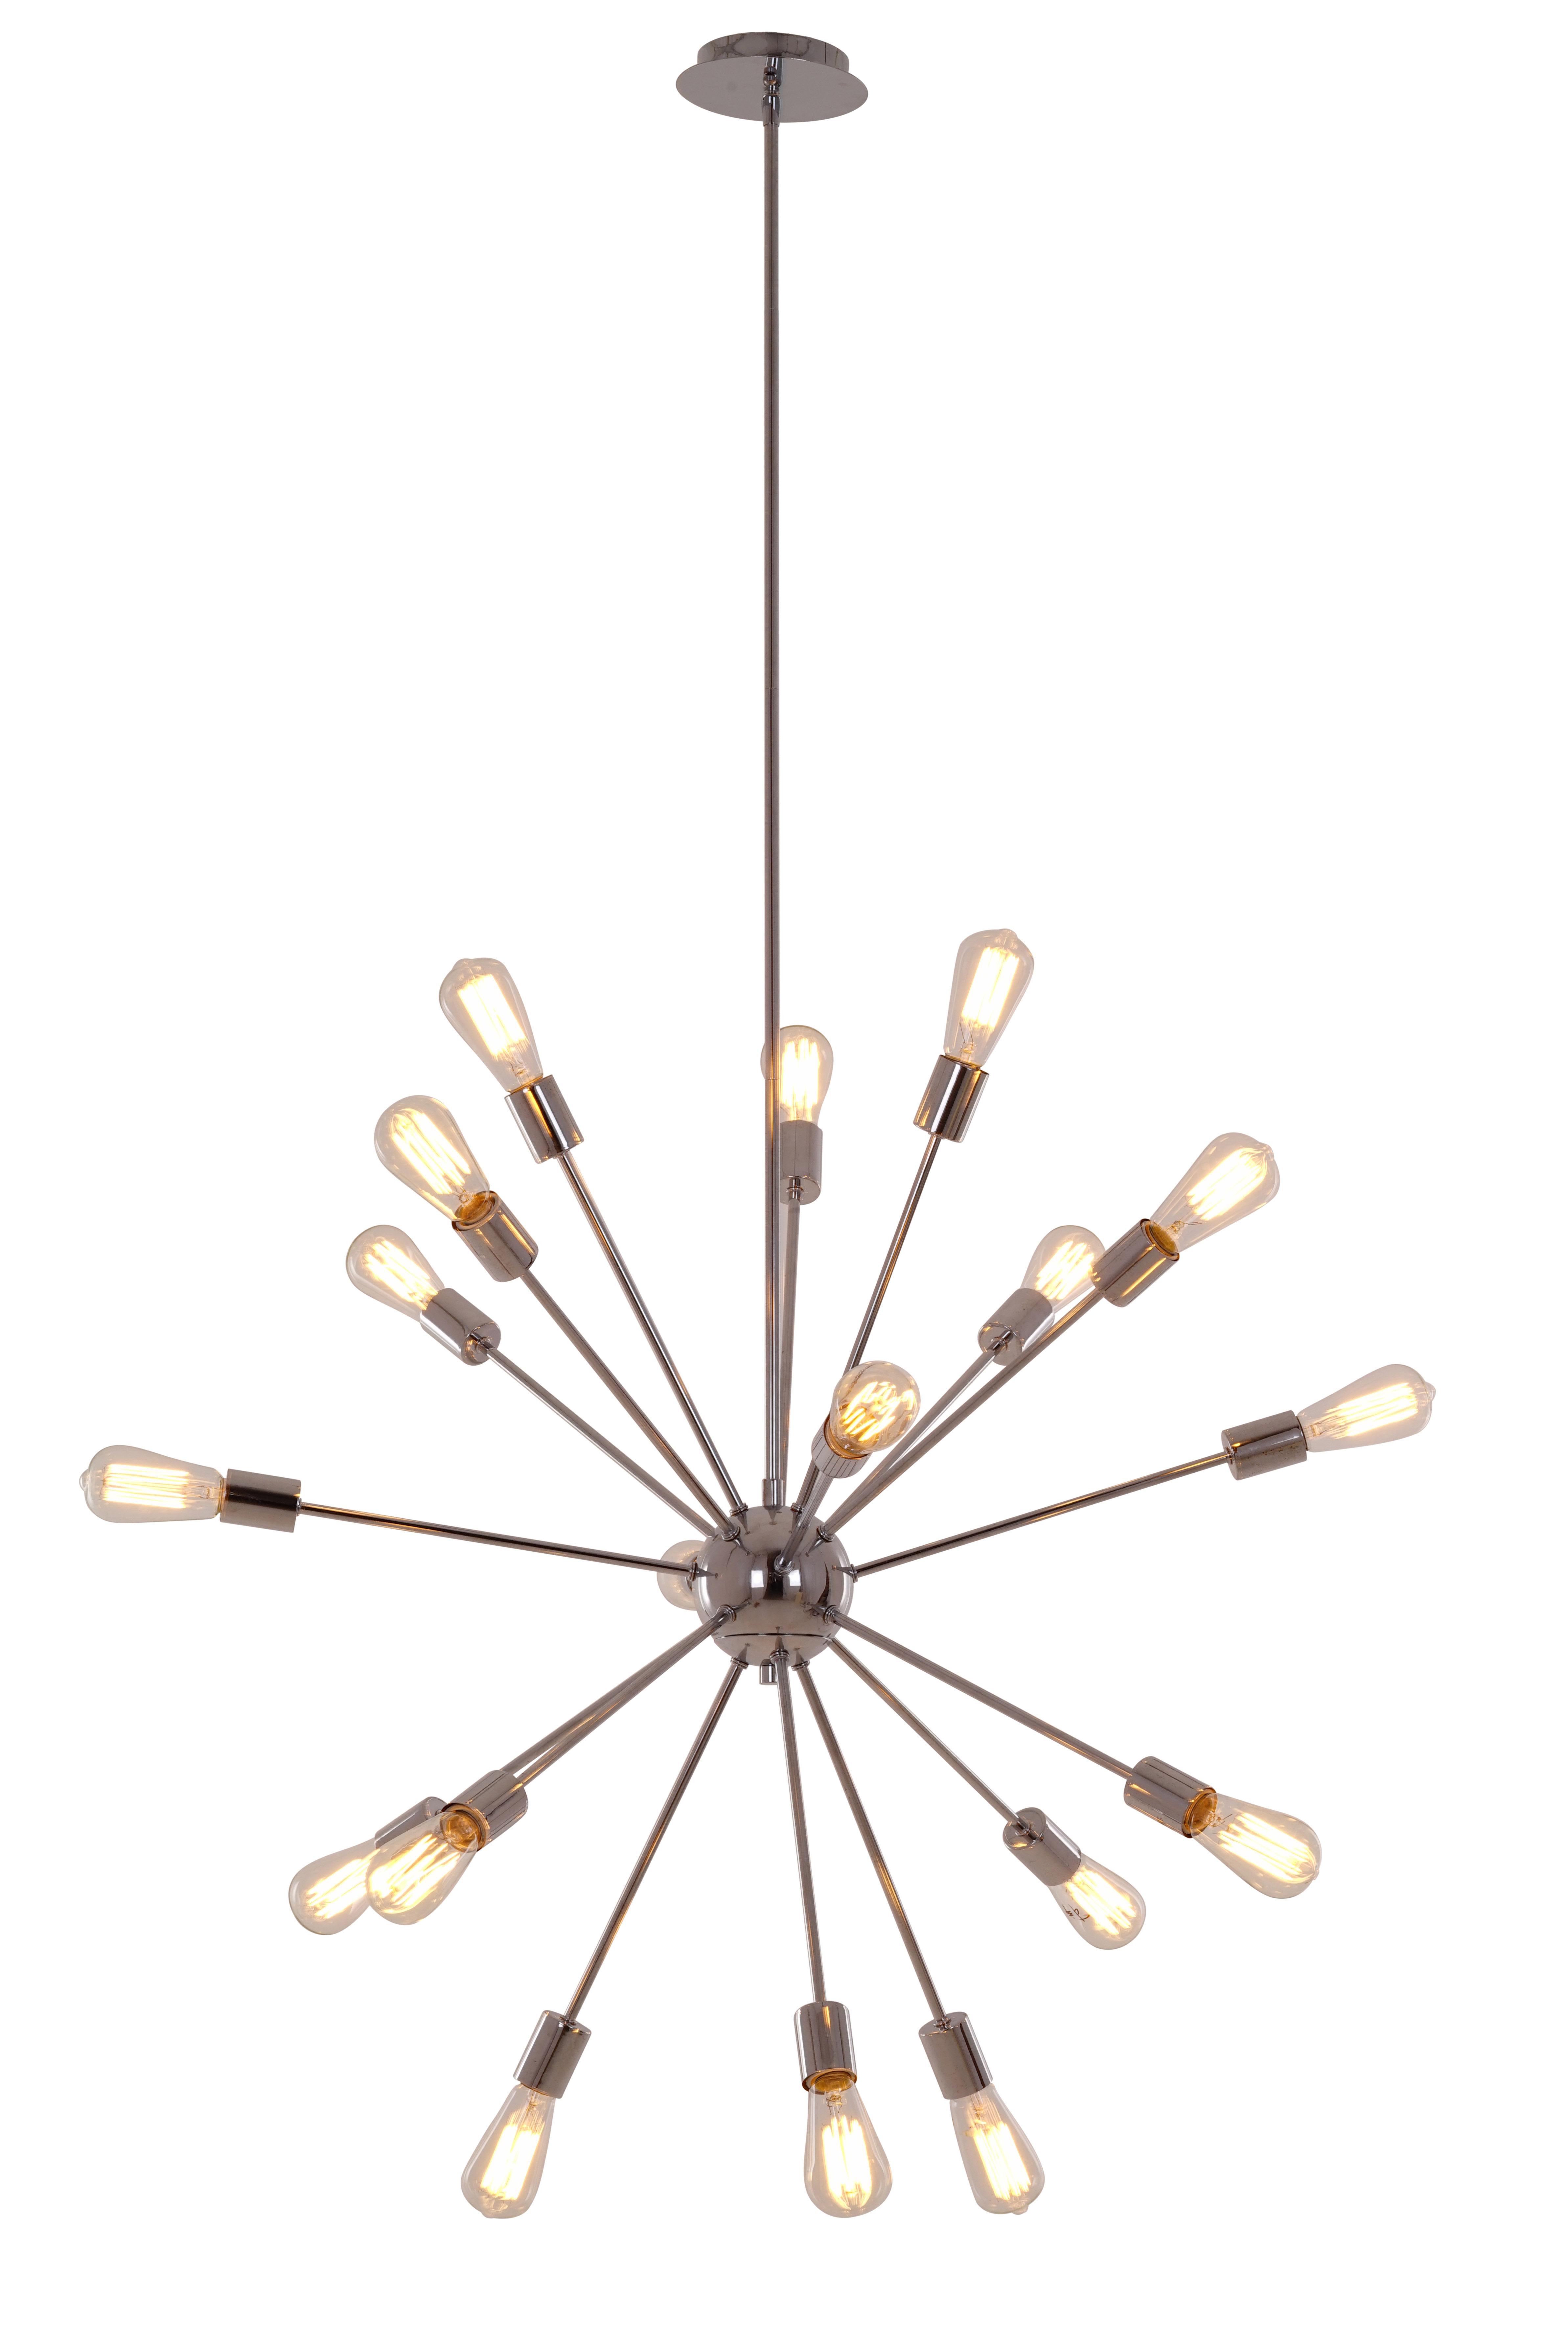 Bach 18 Light Chandelier Inside Defreitas 18 Light Sputnik Chandeliers (View 10 of 30)